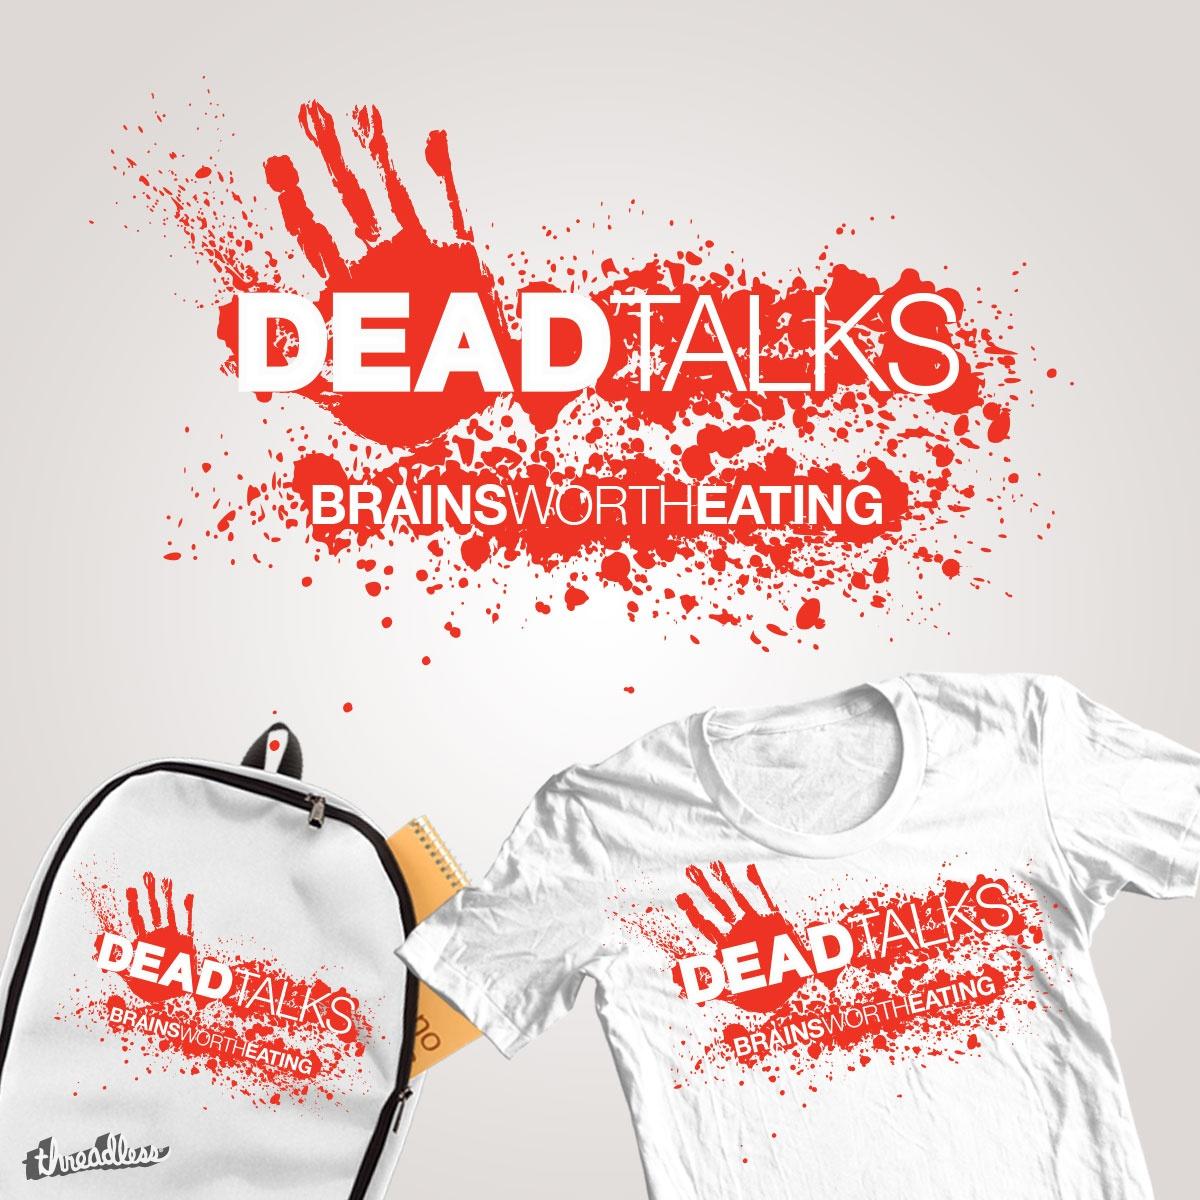 "DEADtalks–""BRAINSworthEATING"" by MnMdesigner on Threadless"